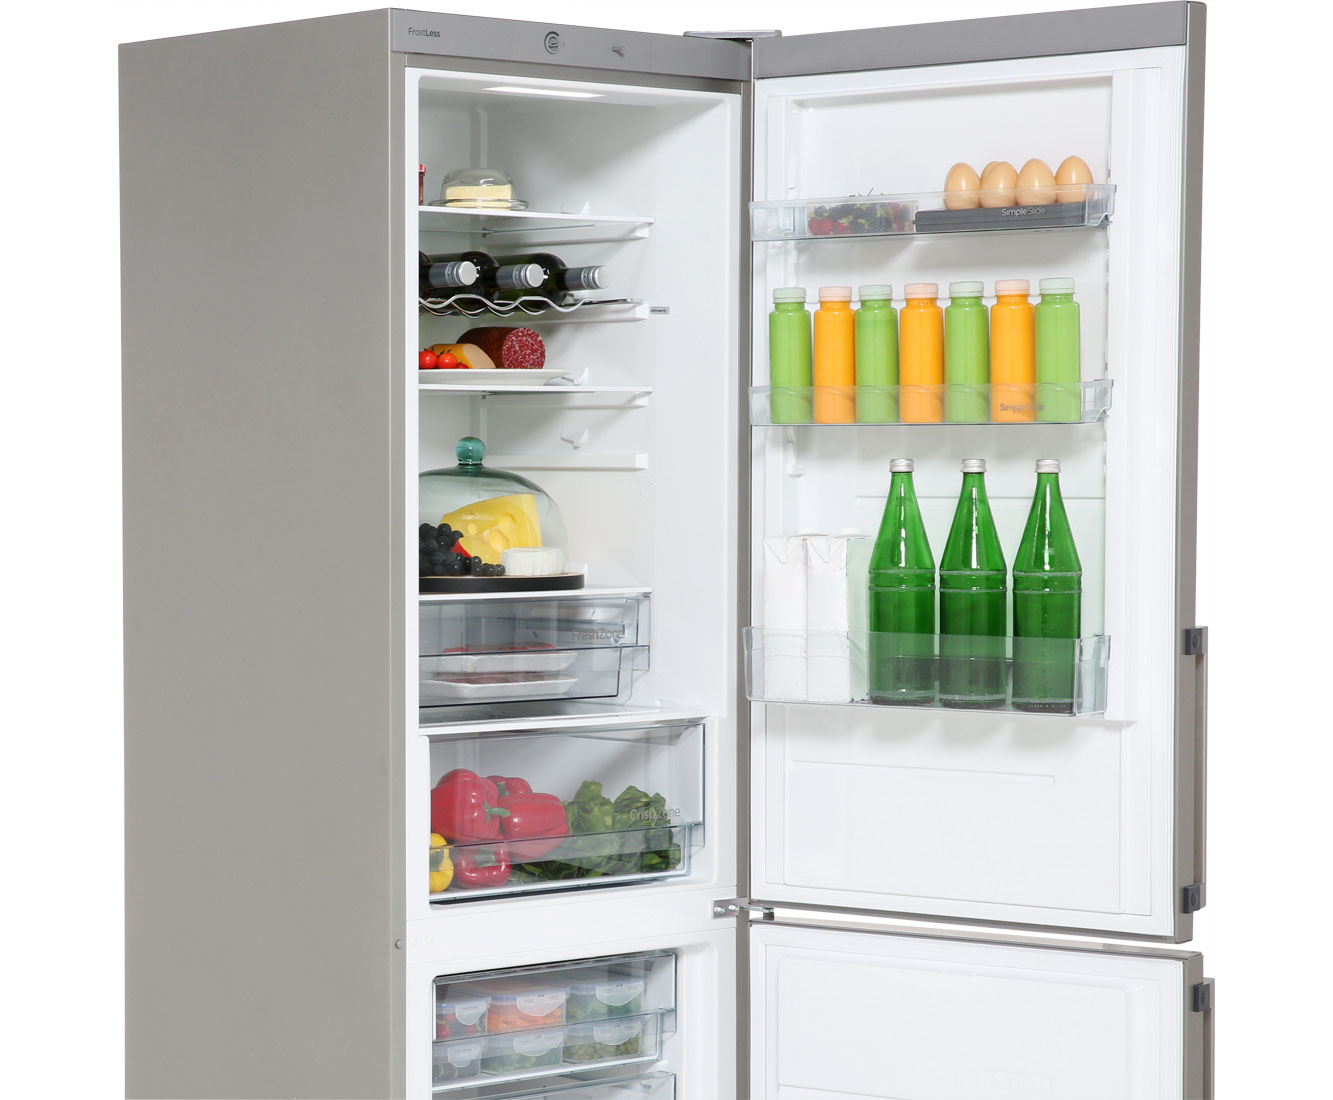 Gorenje Kühlschrank Kombi : Unsere besten kühl gefrierkombinationen bestellen bei ao.de